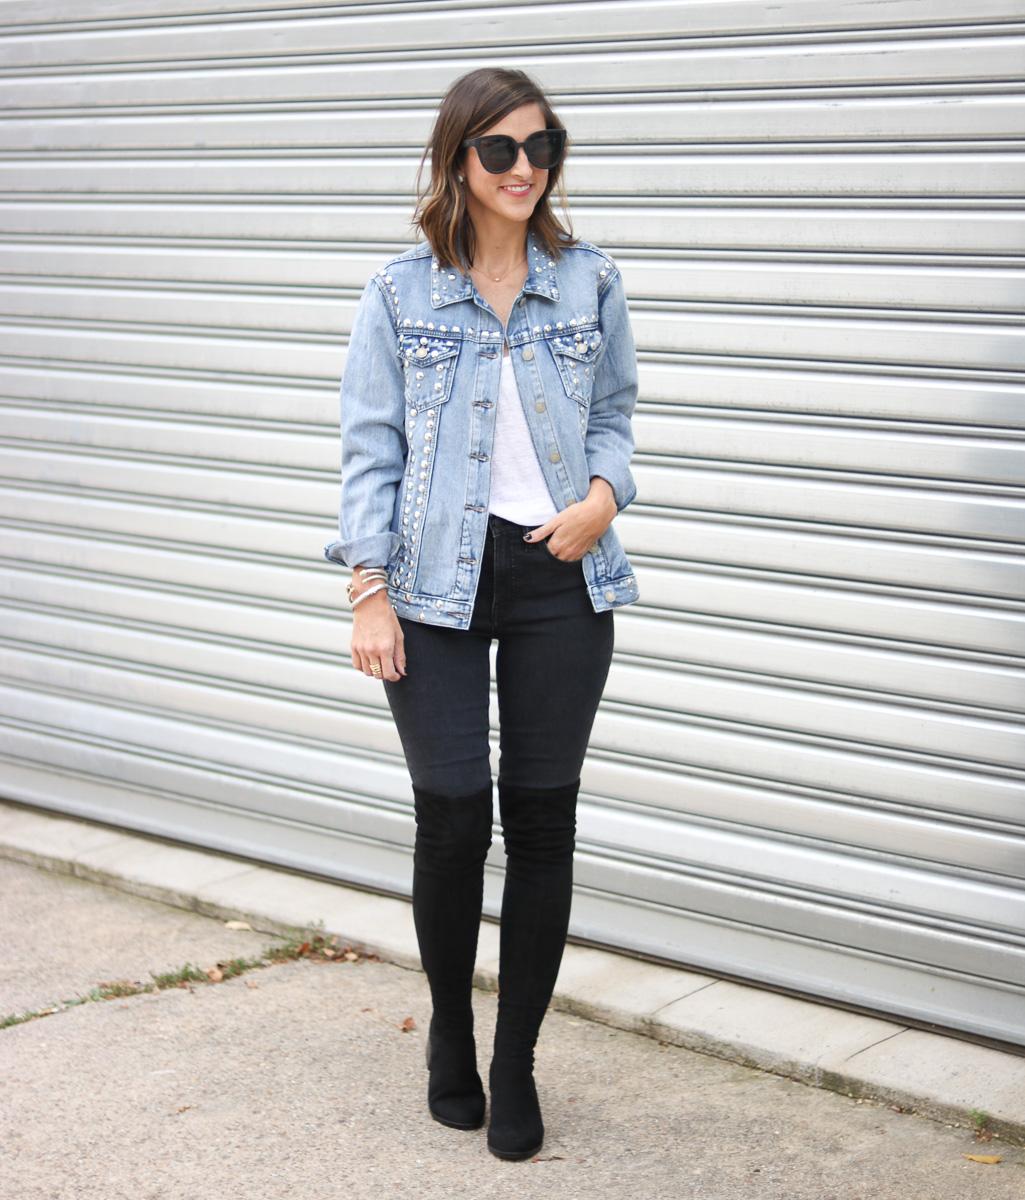 Shop SoSis Boutique Stud Denim Jacket by popular Washington DC fashion blogger Cobalt Chronicles